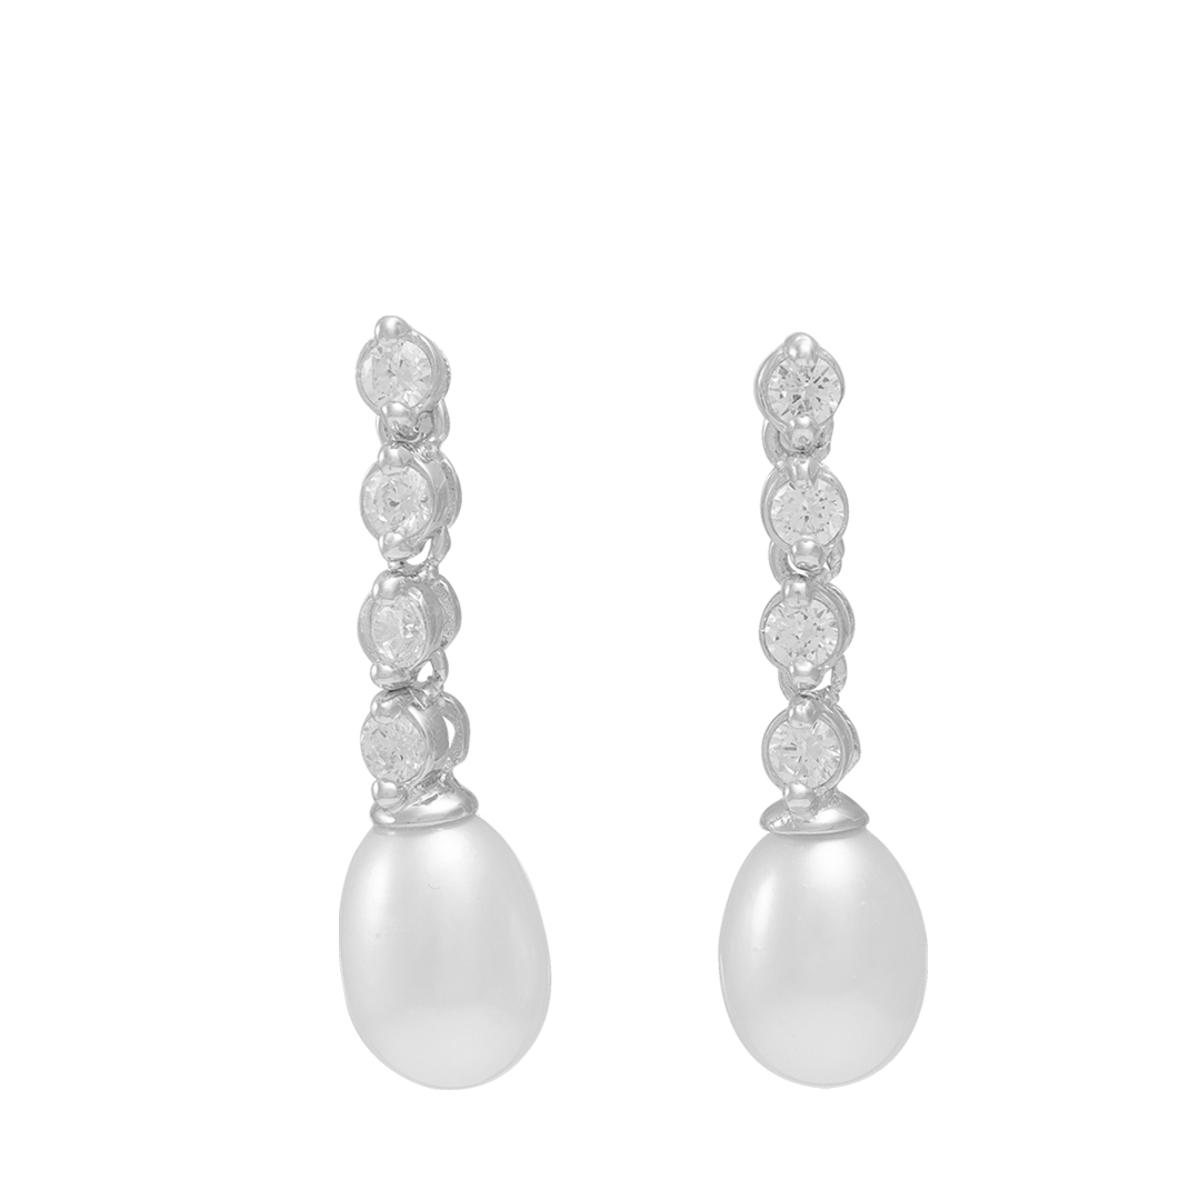 Paul Vallette Jewellery Fashion Crystal Diamond Freshwater Pearl Earrings – PVE5003-S